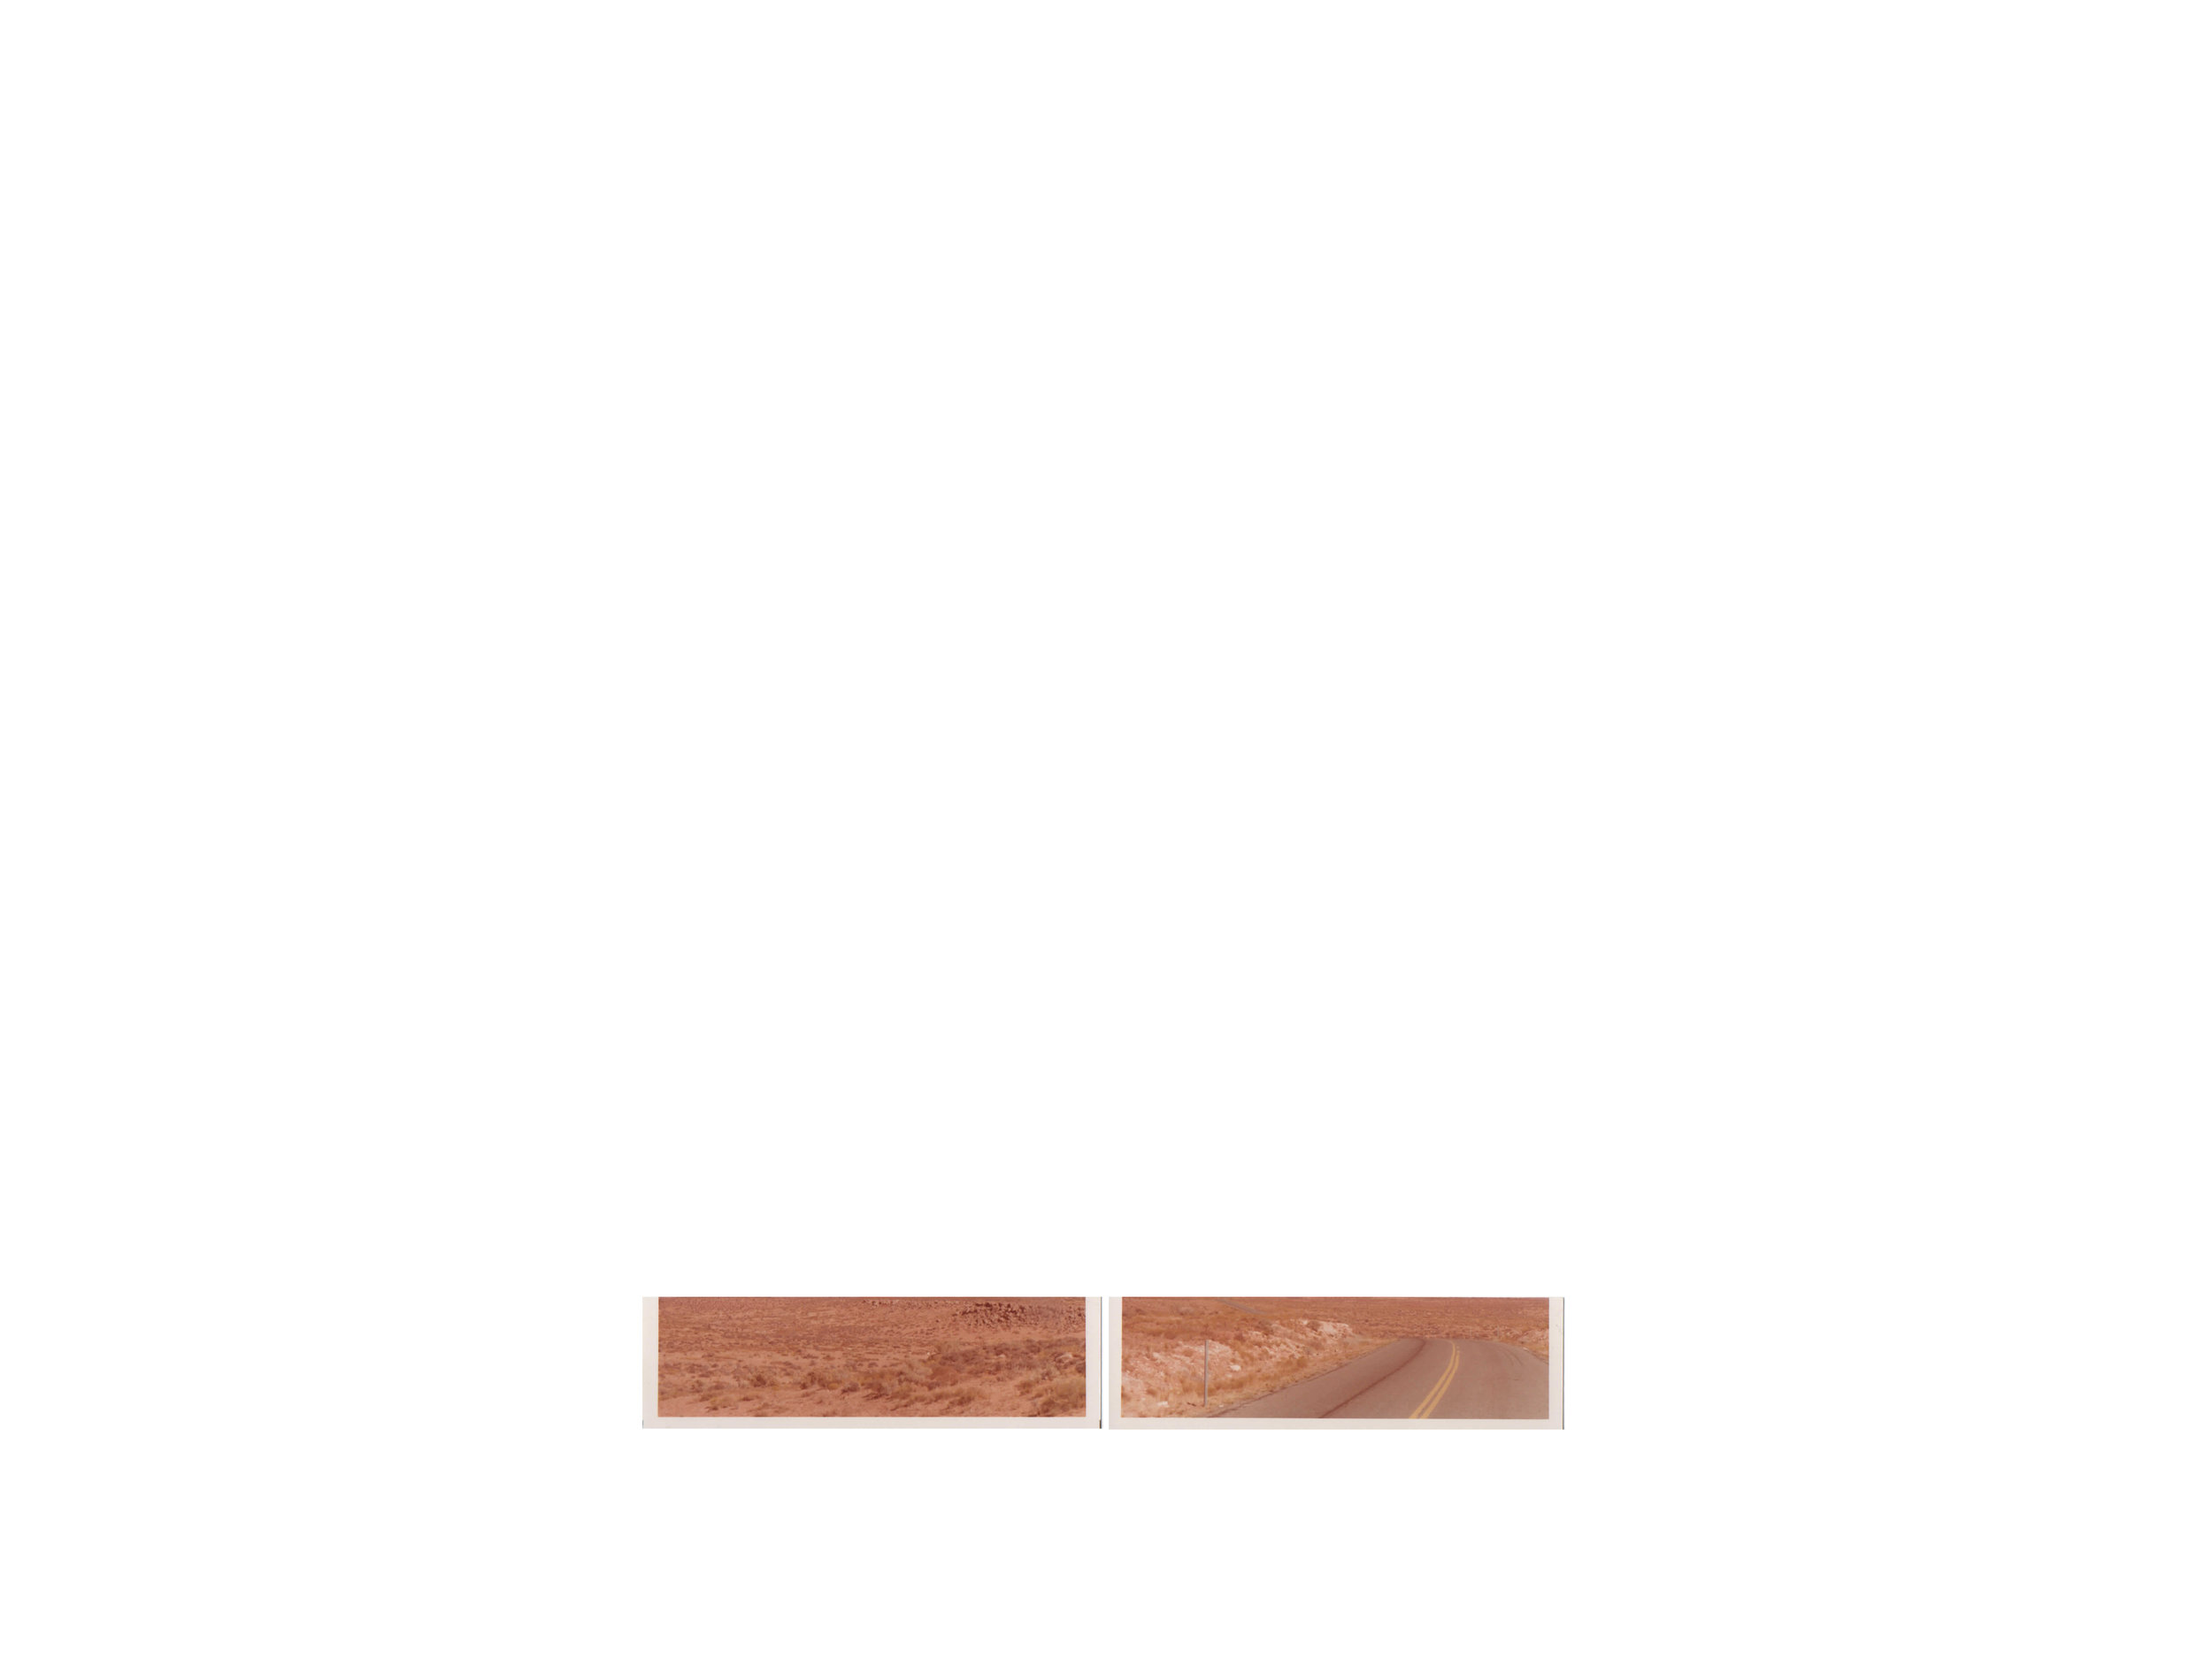 Westward Yearning No. 10  18 x 24 inches | 2018